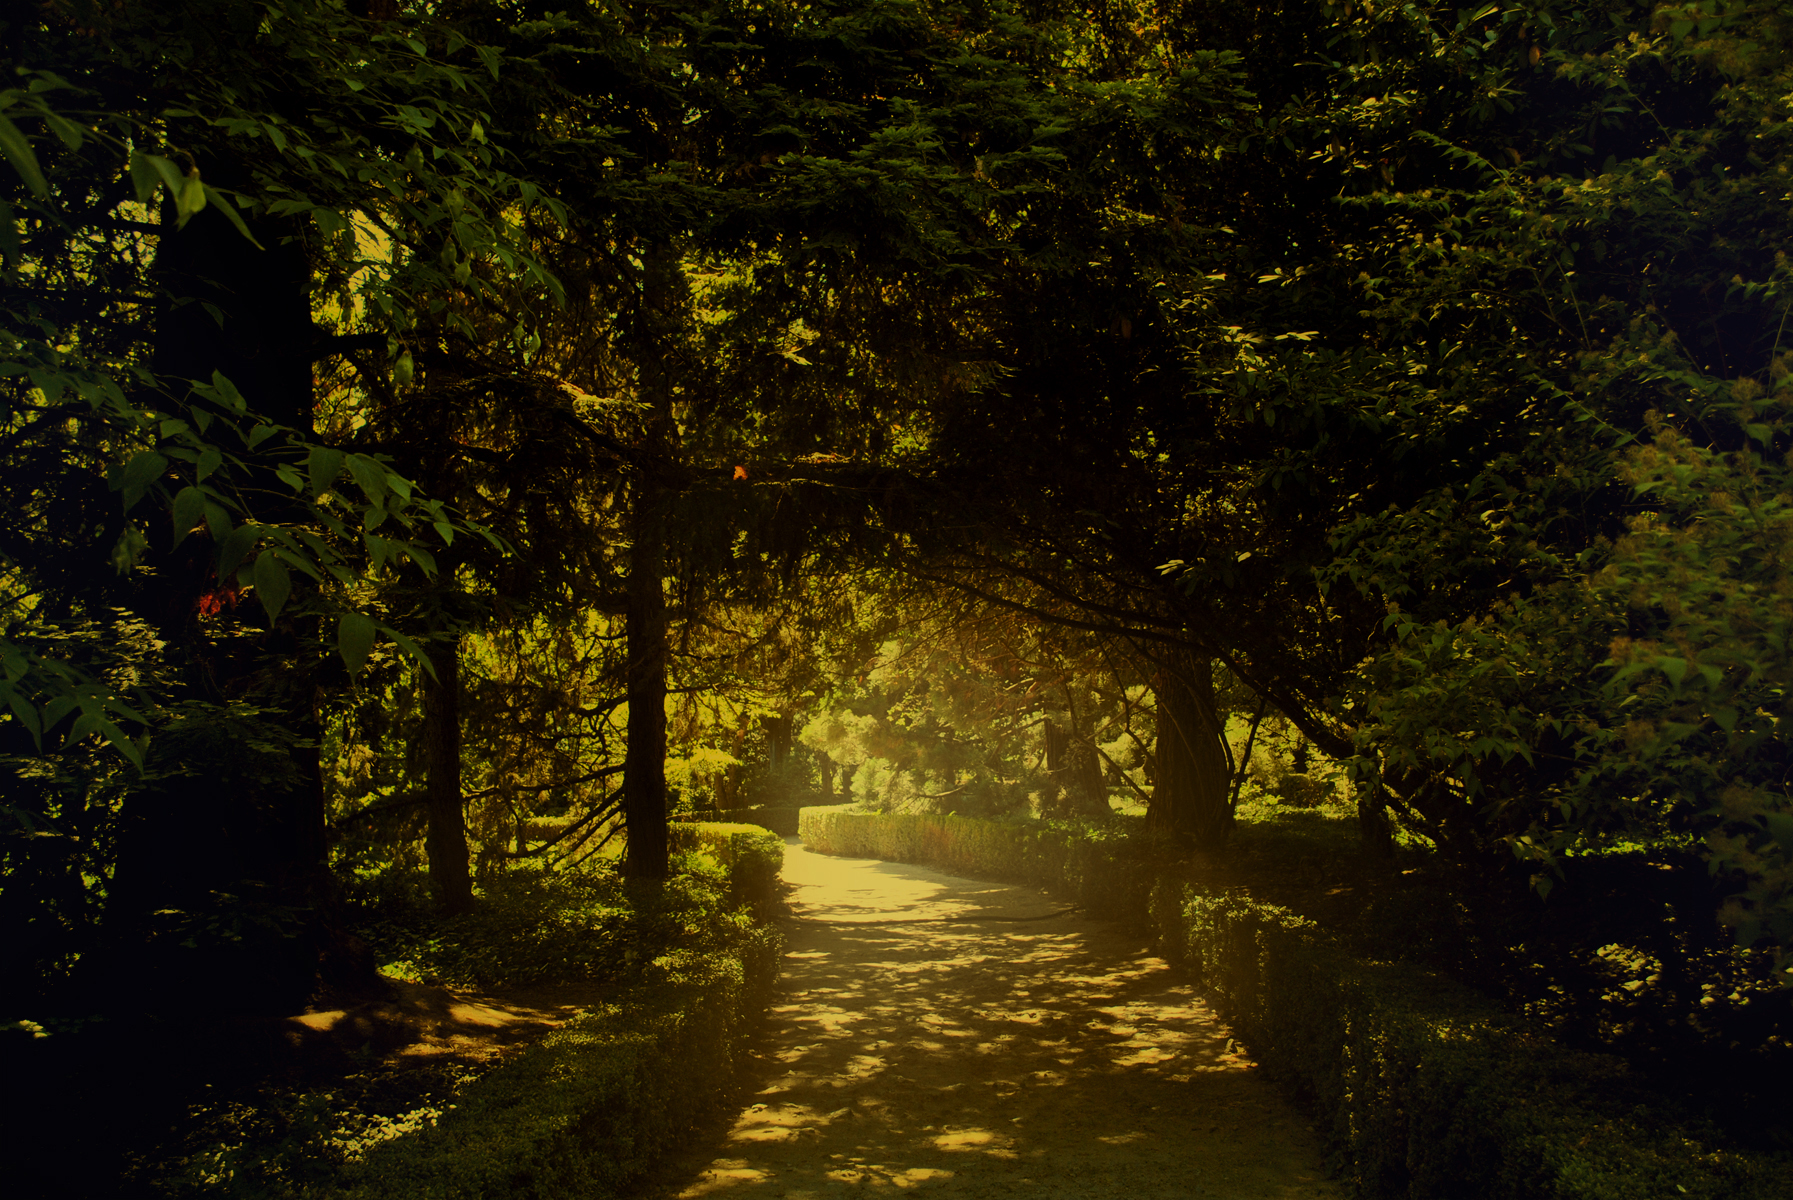 Description Magical_garden_by_fantazyme-d5345x6